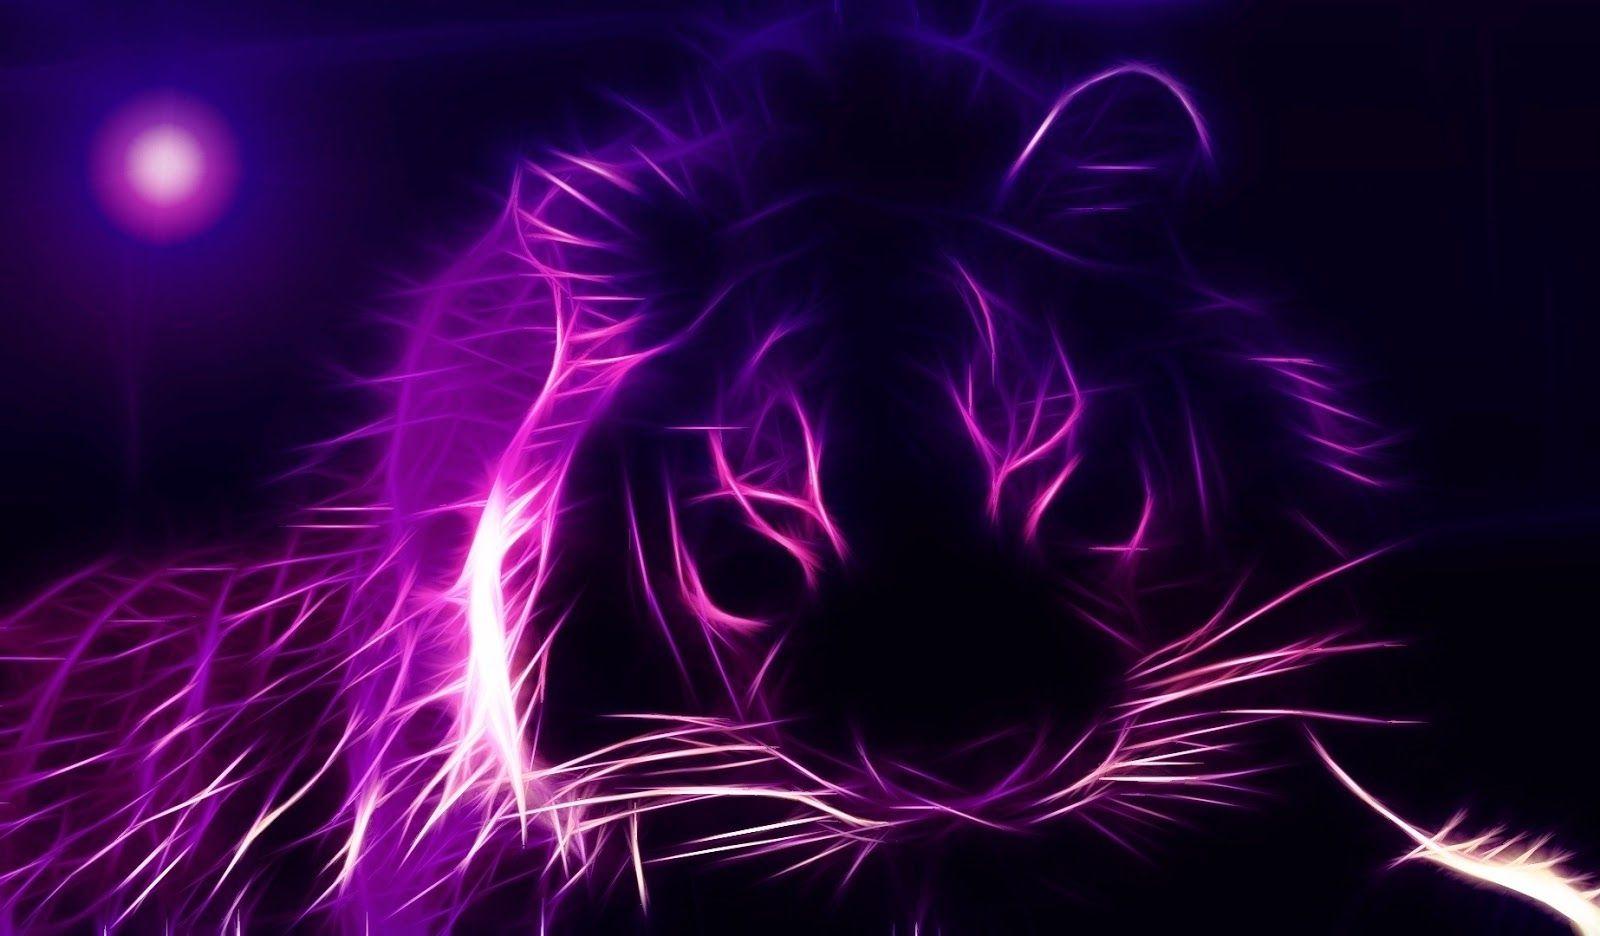 Black Purple Lion Paars Behang Paarse Achtergronden Dieren Mooi